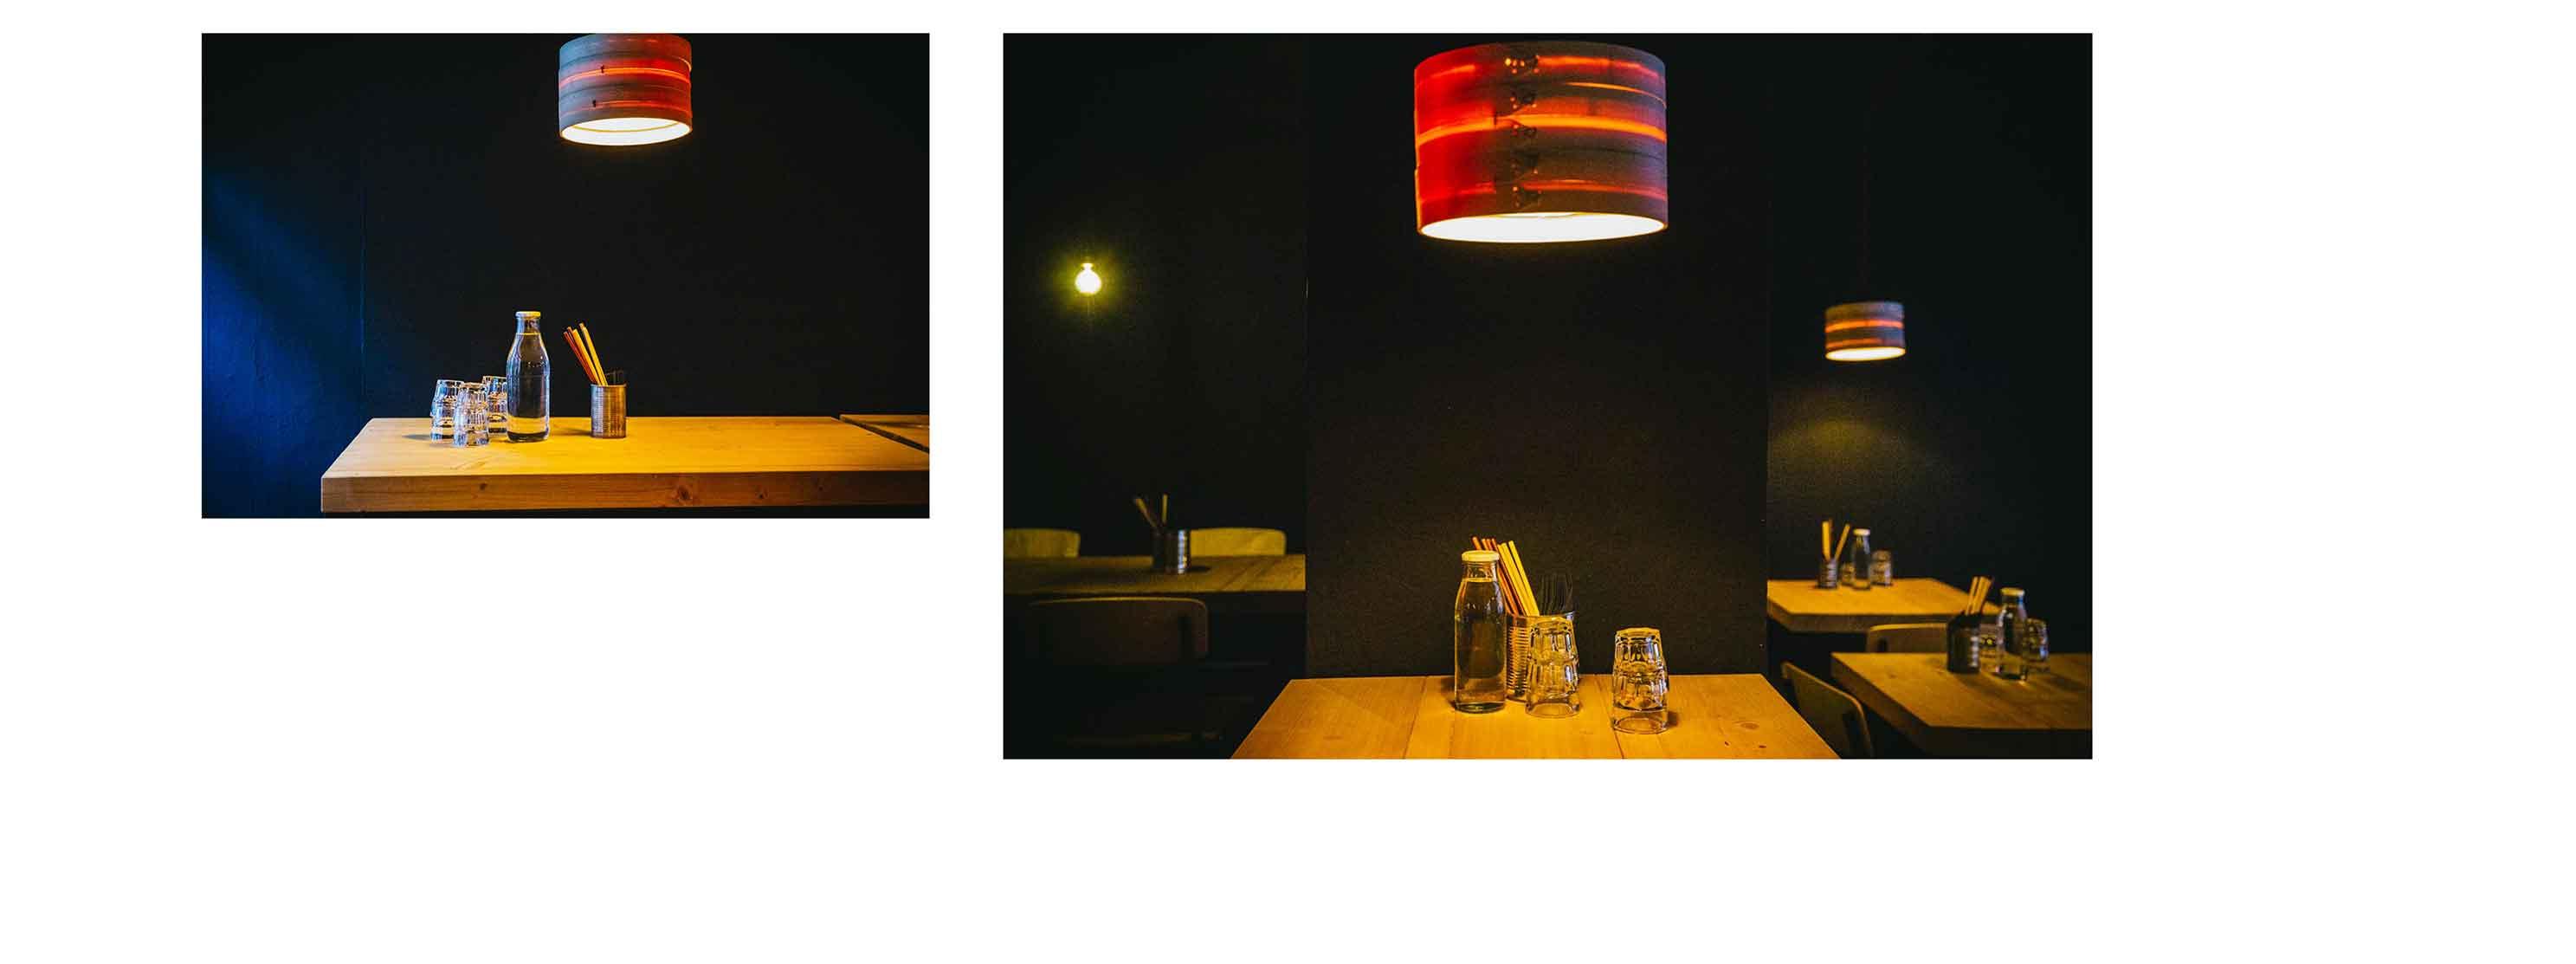 09-oh-boi-bar-food-augsburg-branding-design-table-lights